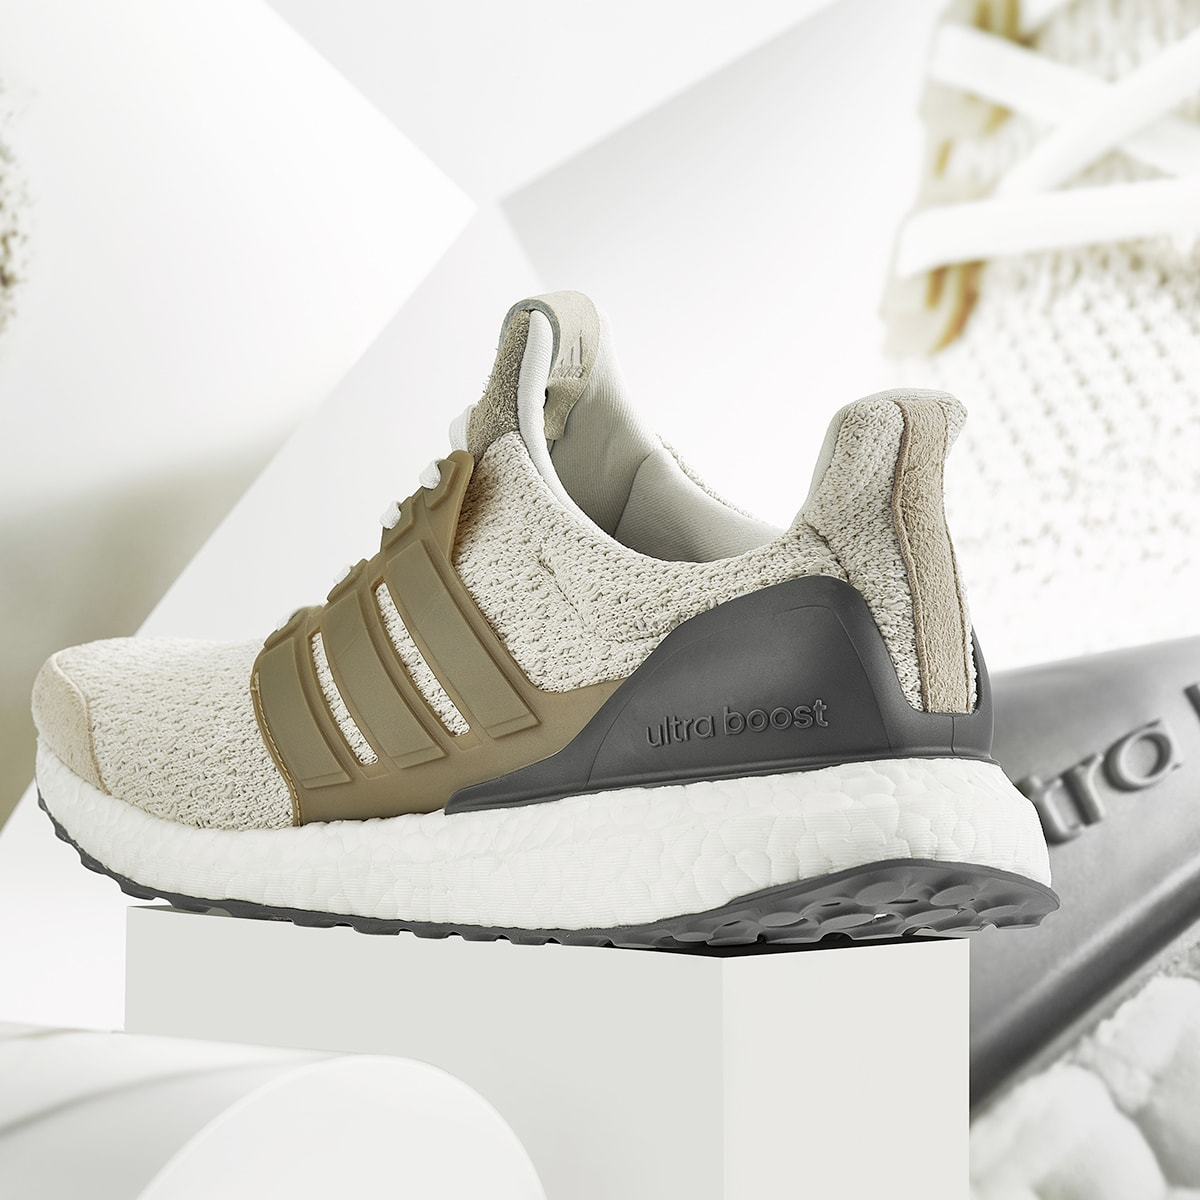 adidas Consortium UltraBoost Lux Vintage White | Footshop